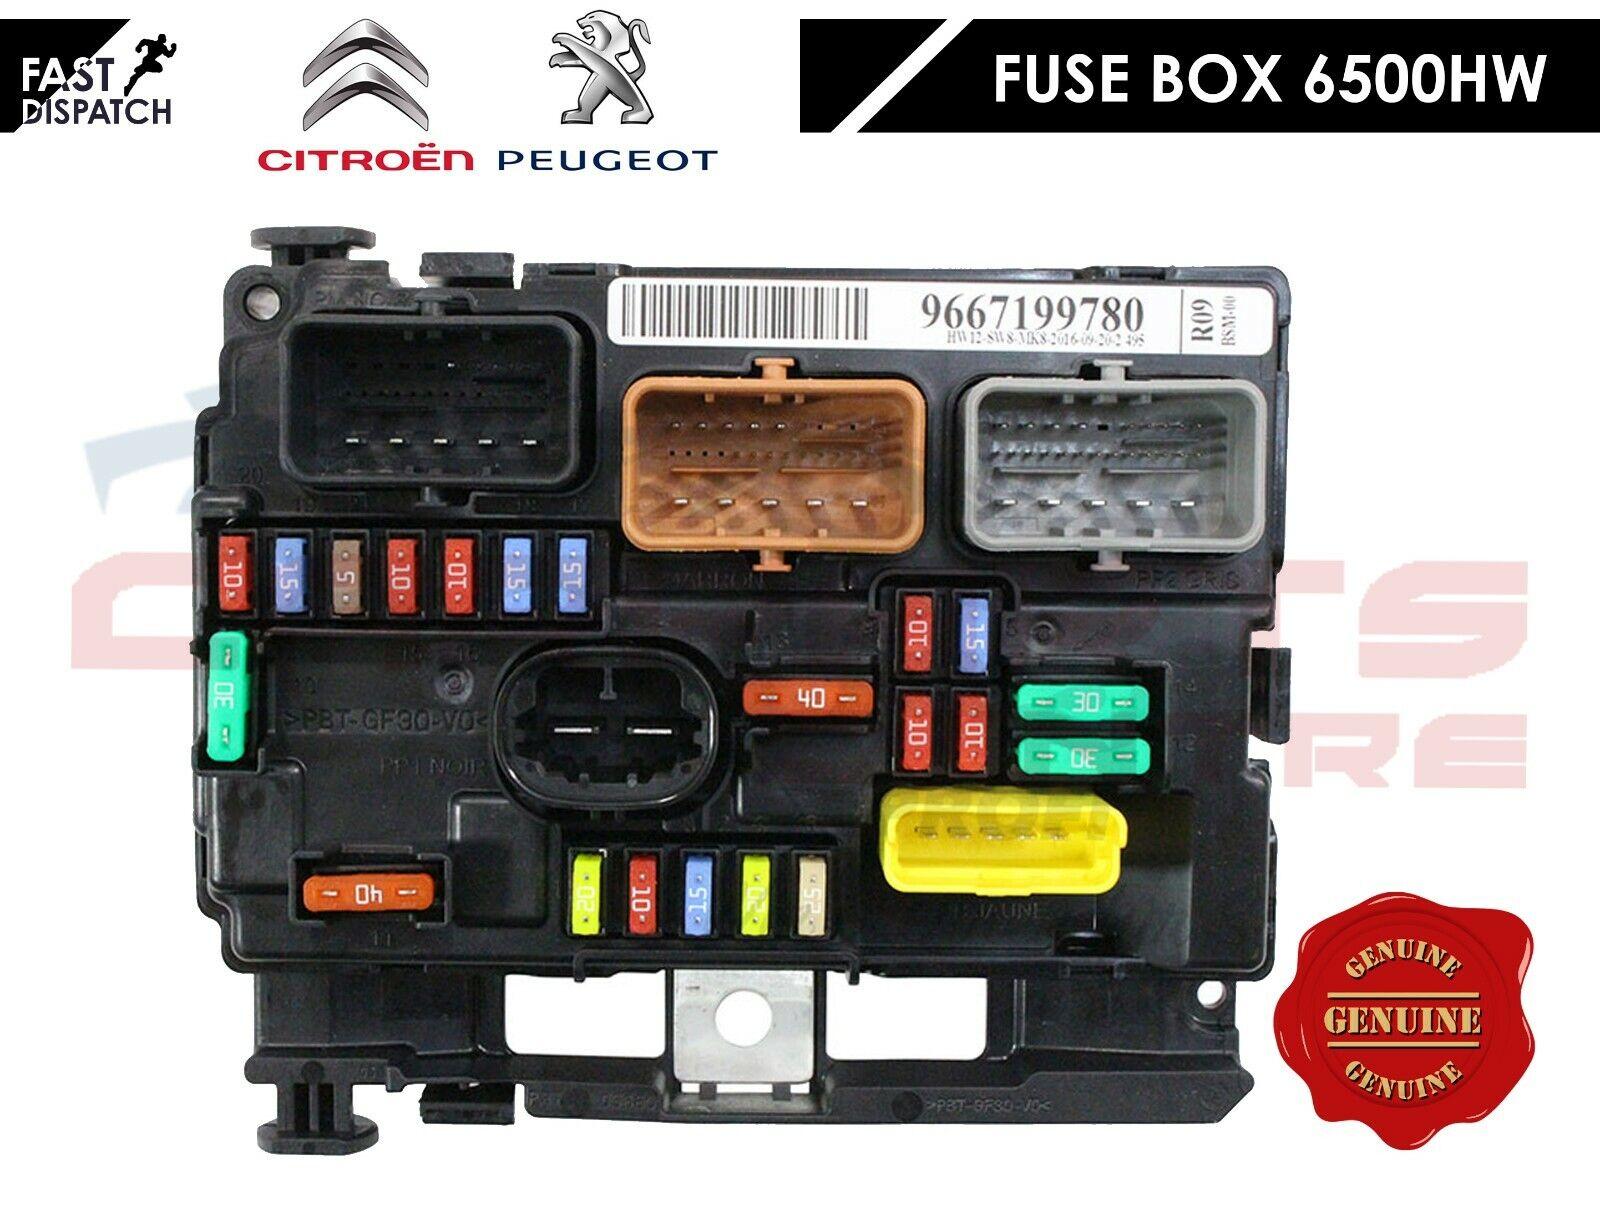 Citroen C3 Engine Fuse Box - duflot-conseil.fr symbol-embark -  symbol-embark.duflot-conseil.fr   Citroen C3 Fuse Box Layout      diagram database - Duflot Conseil